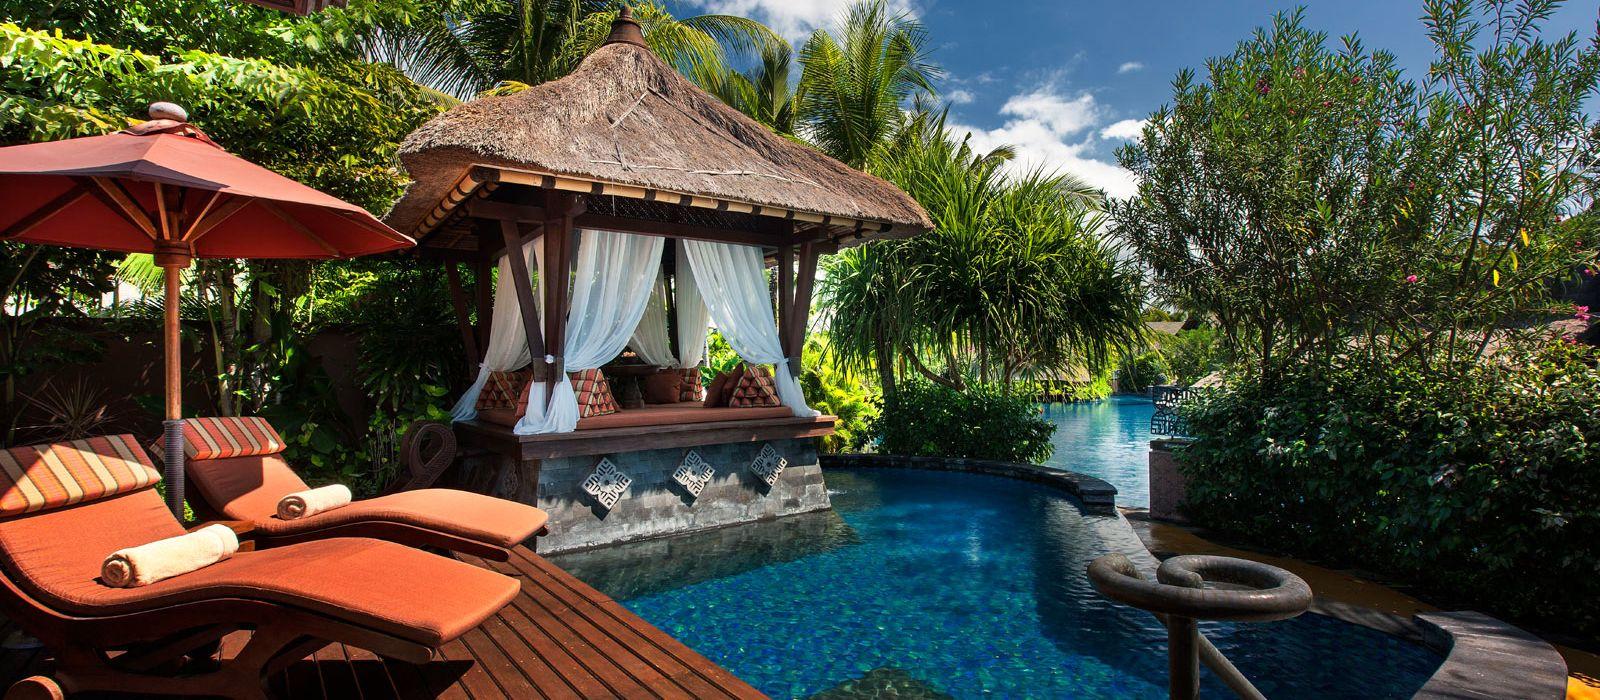 Hotel St. Regis Bali Resort Indonesia